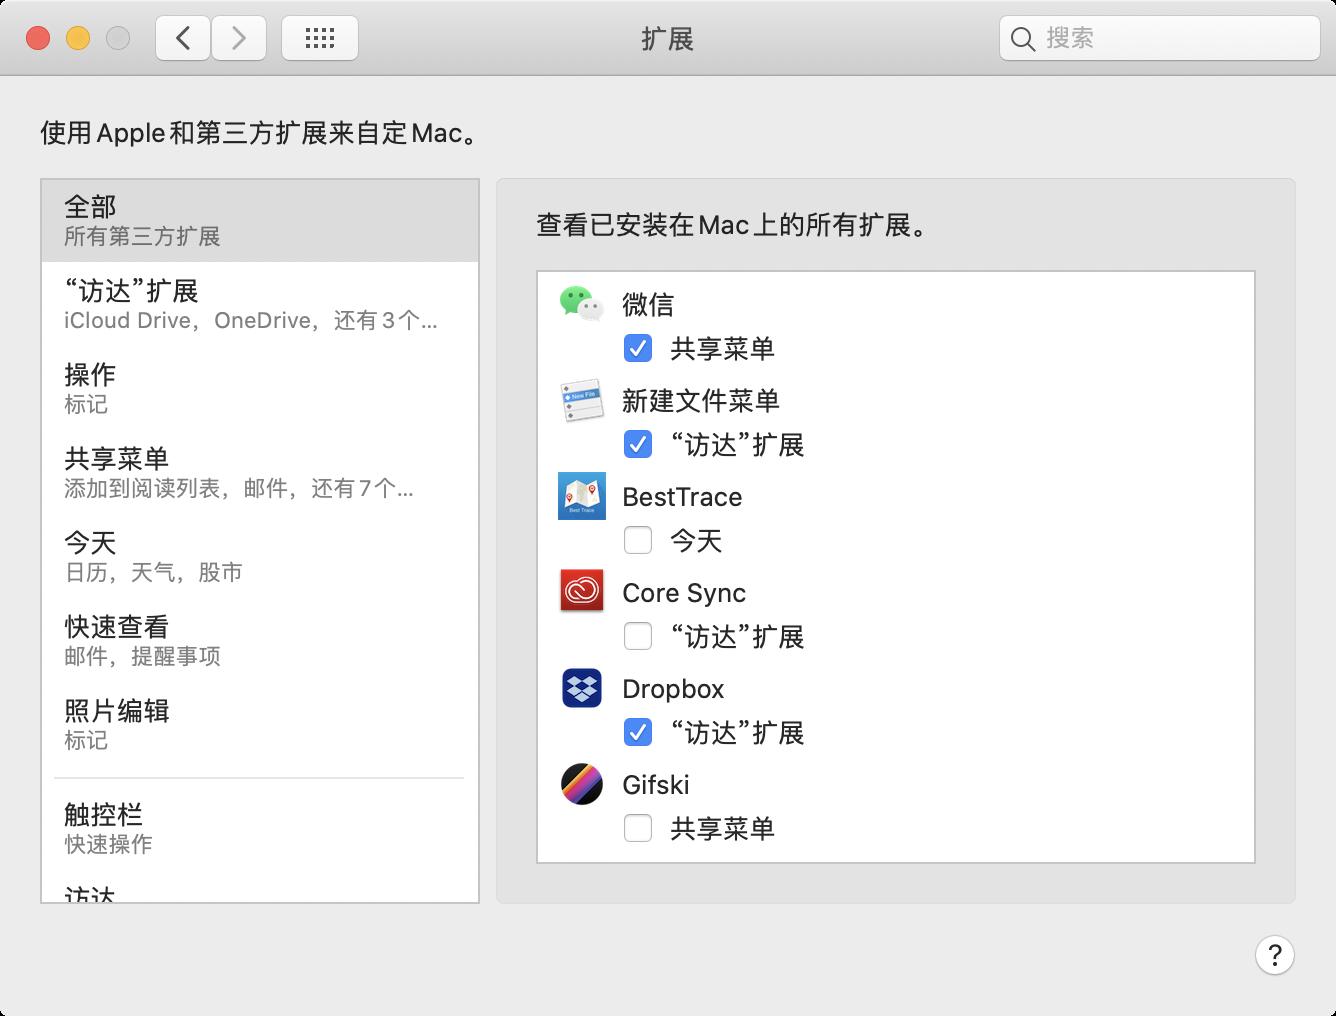 New File Menu 作为 Finder 的扩展